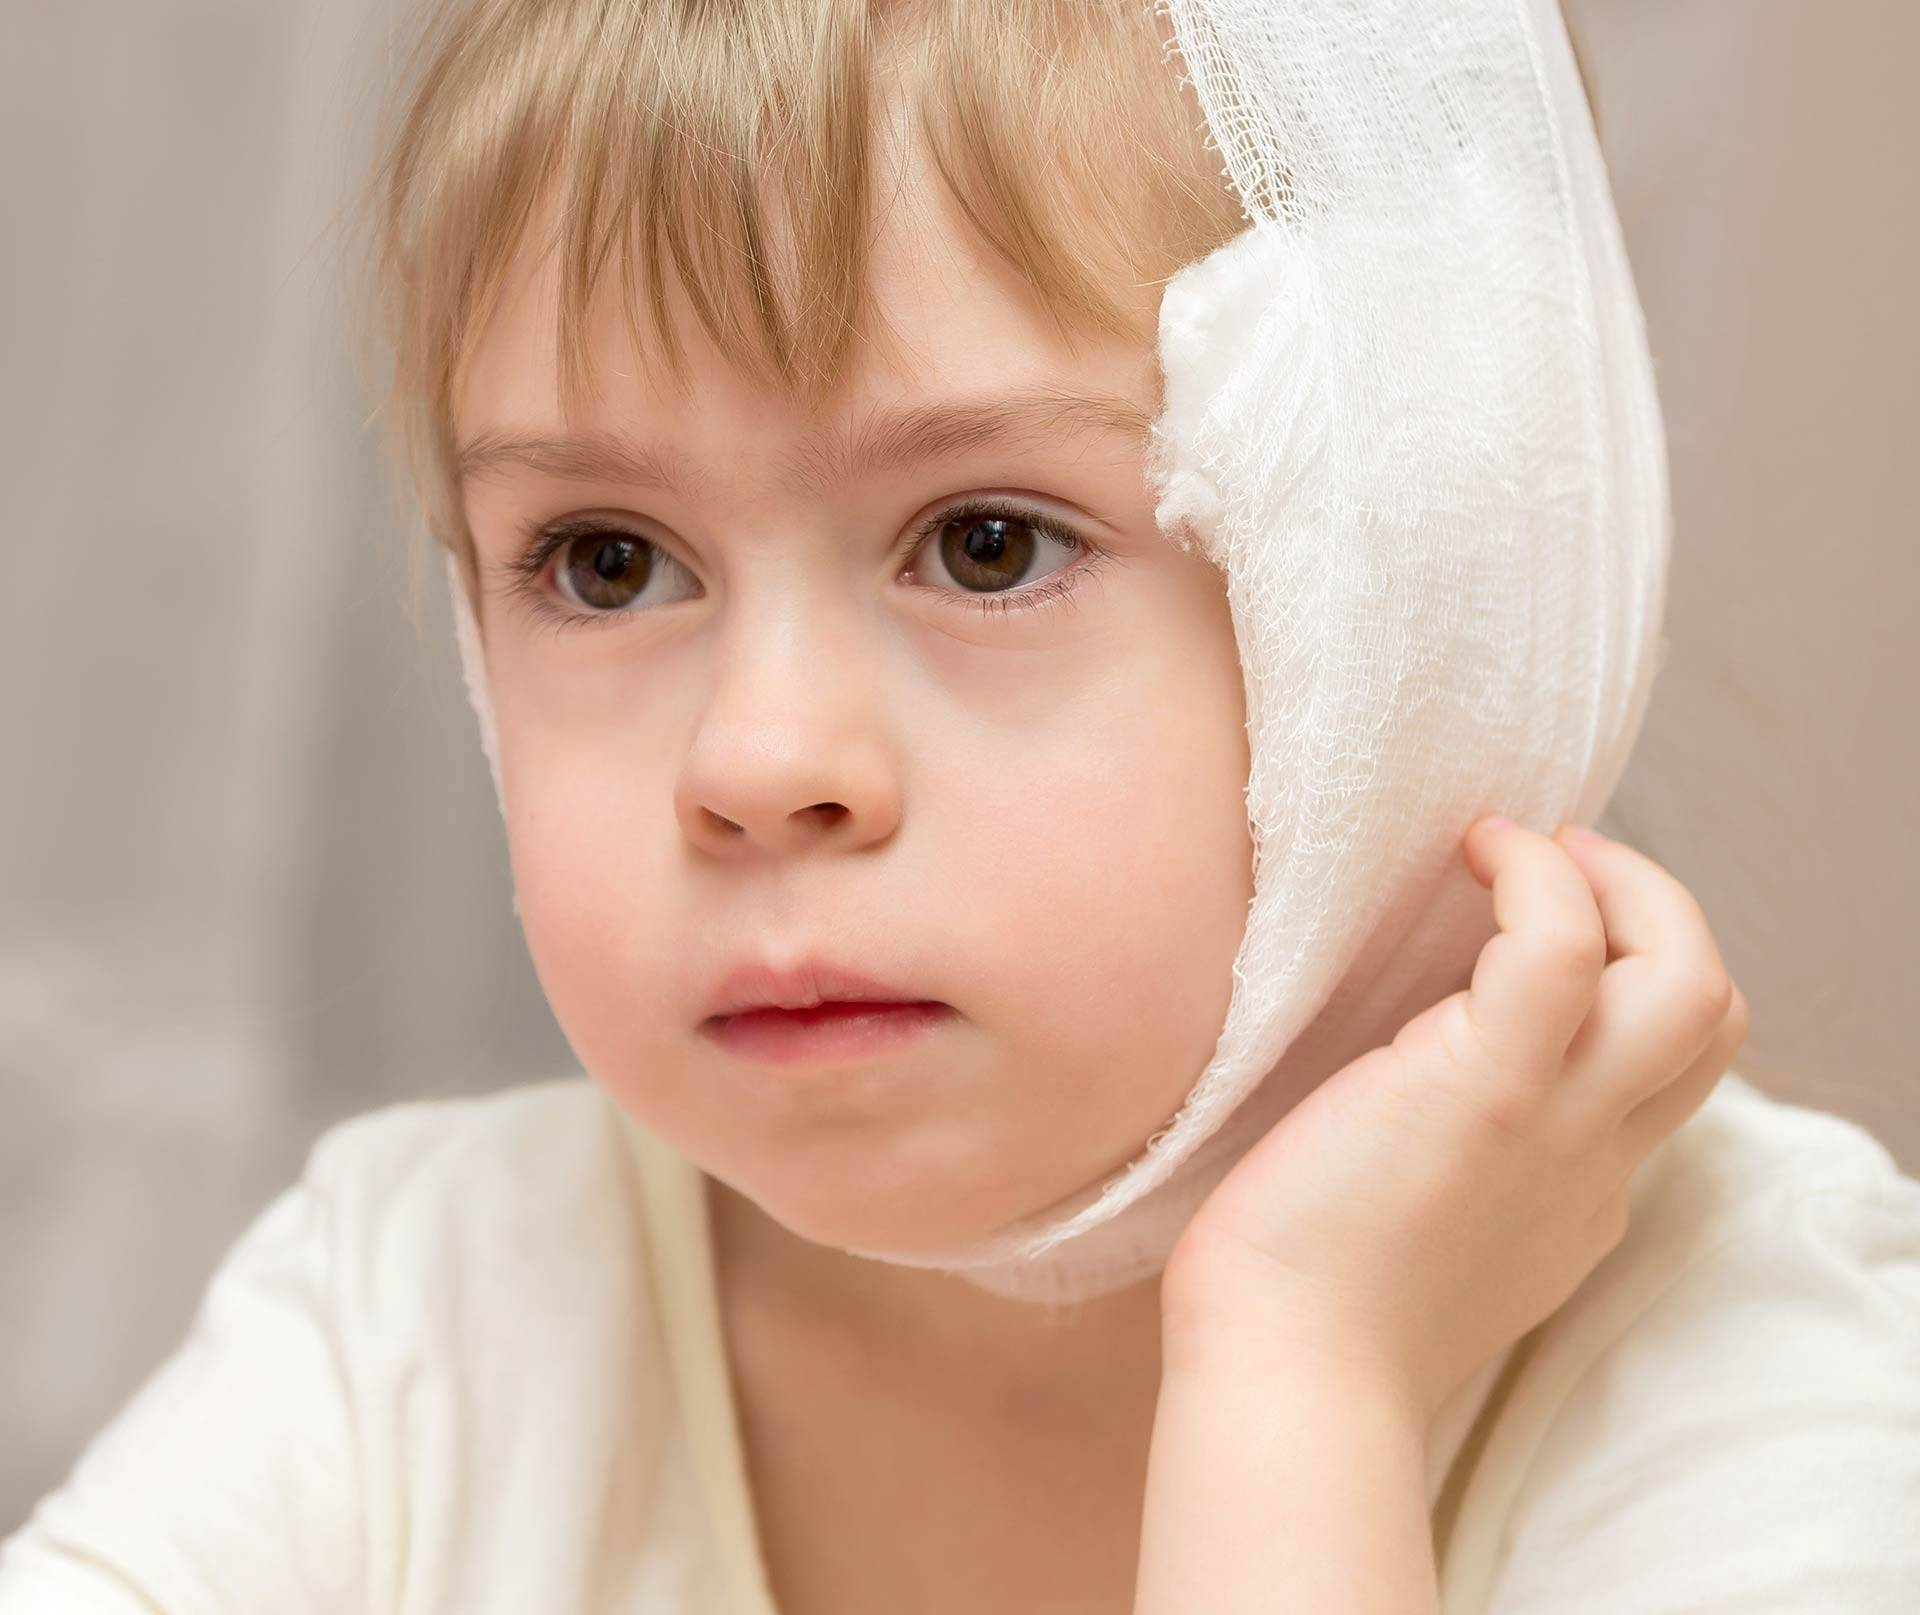 компресс при боли в ухе